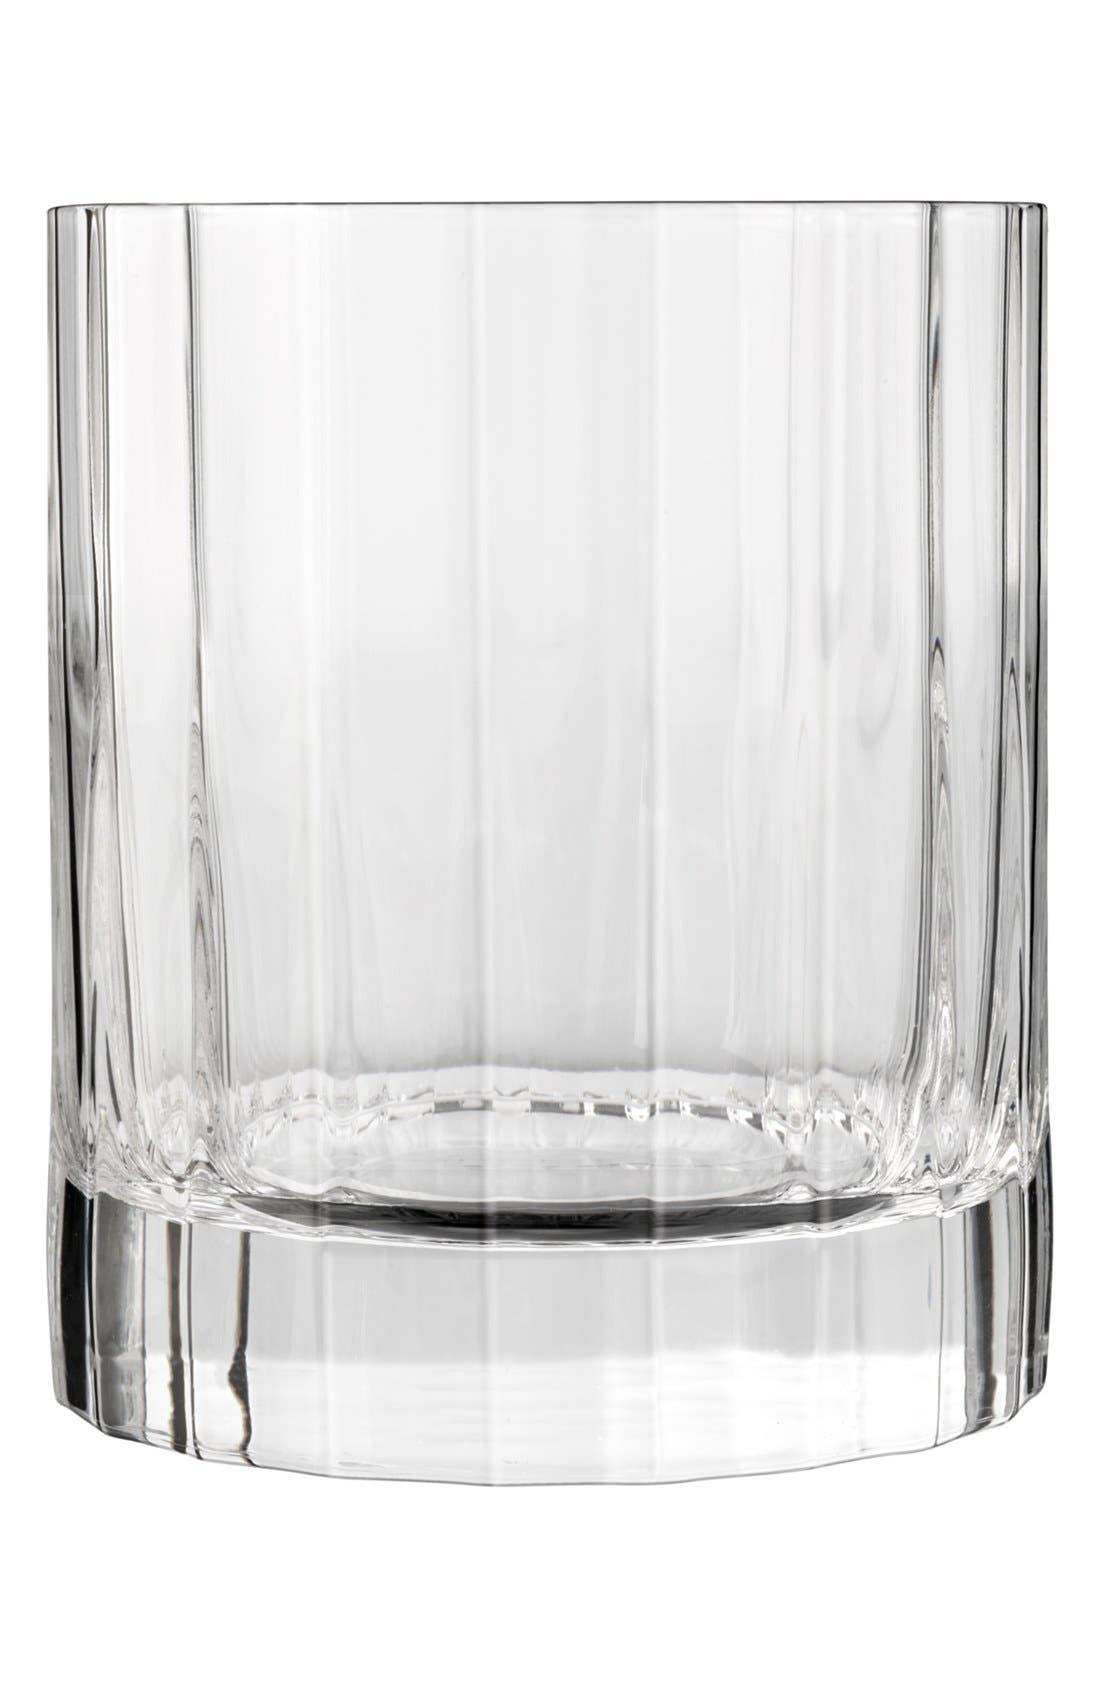 LUIGI BORMIOLI 'Bach' Double Old Fashioned Glasses